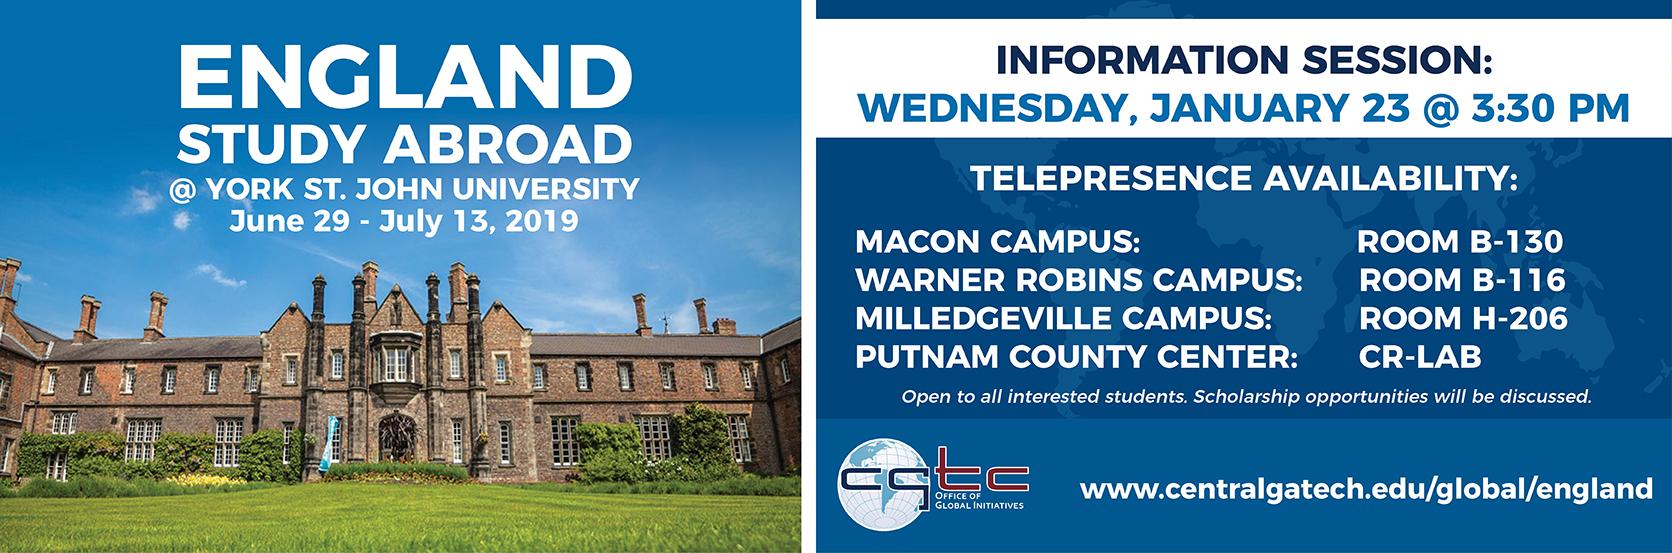 England Study Abroad | York St. John University | June 29-July 13, 2019